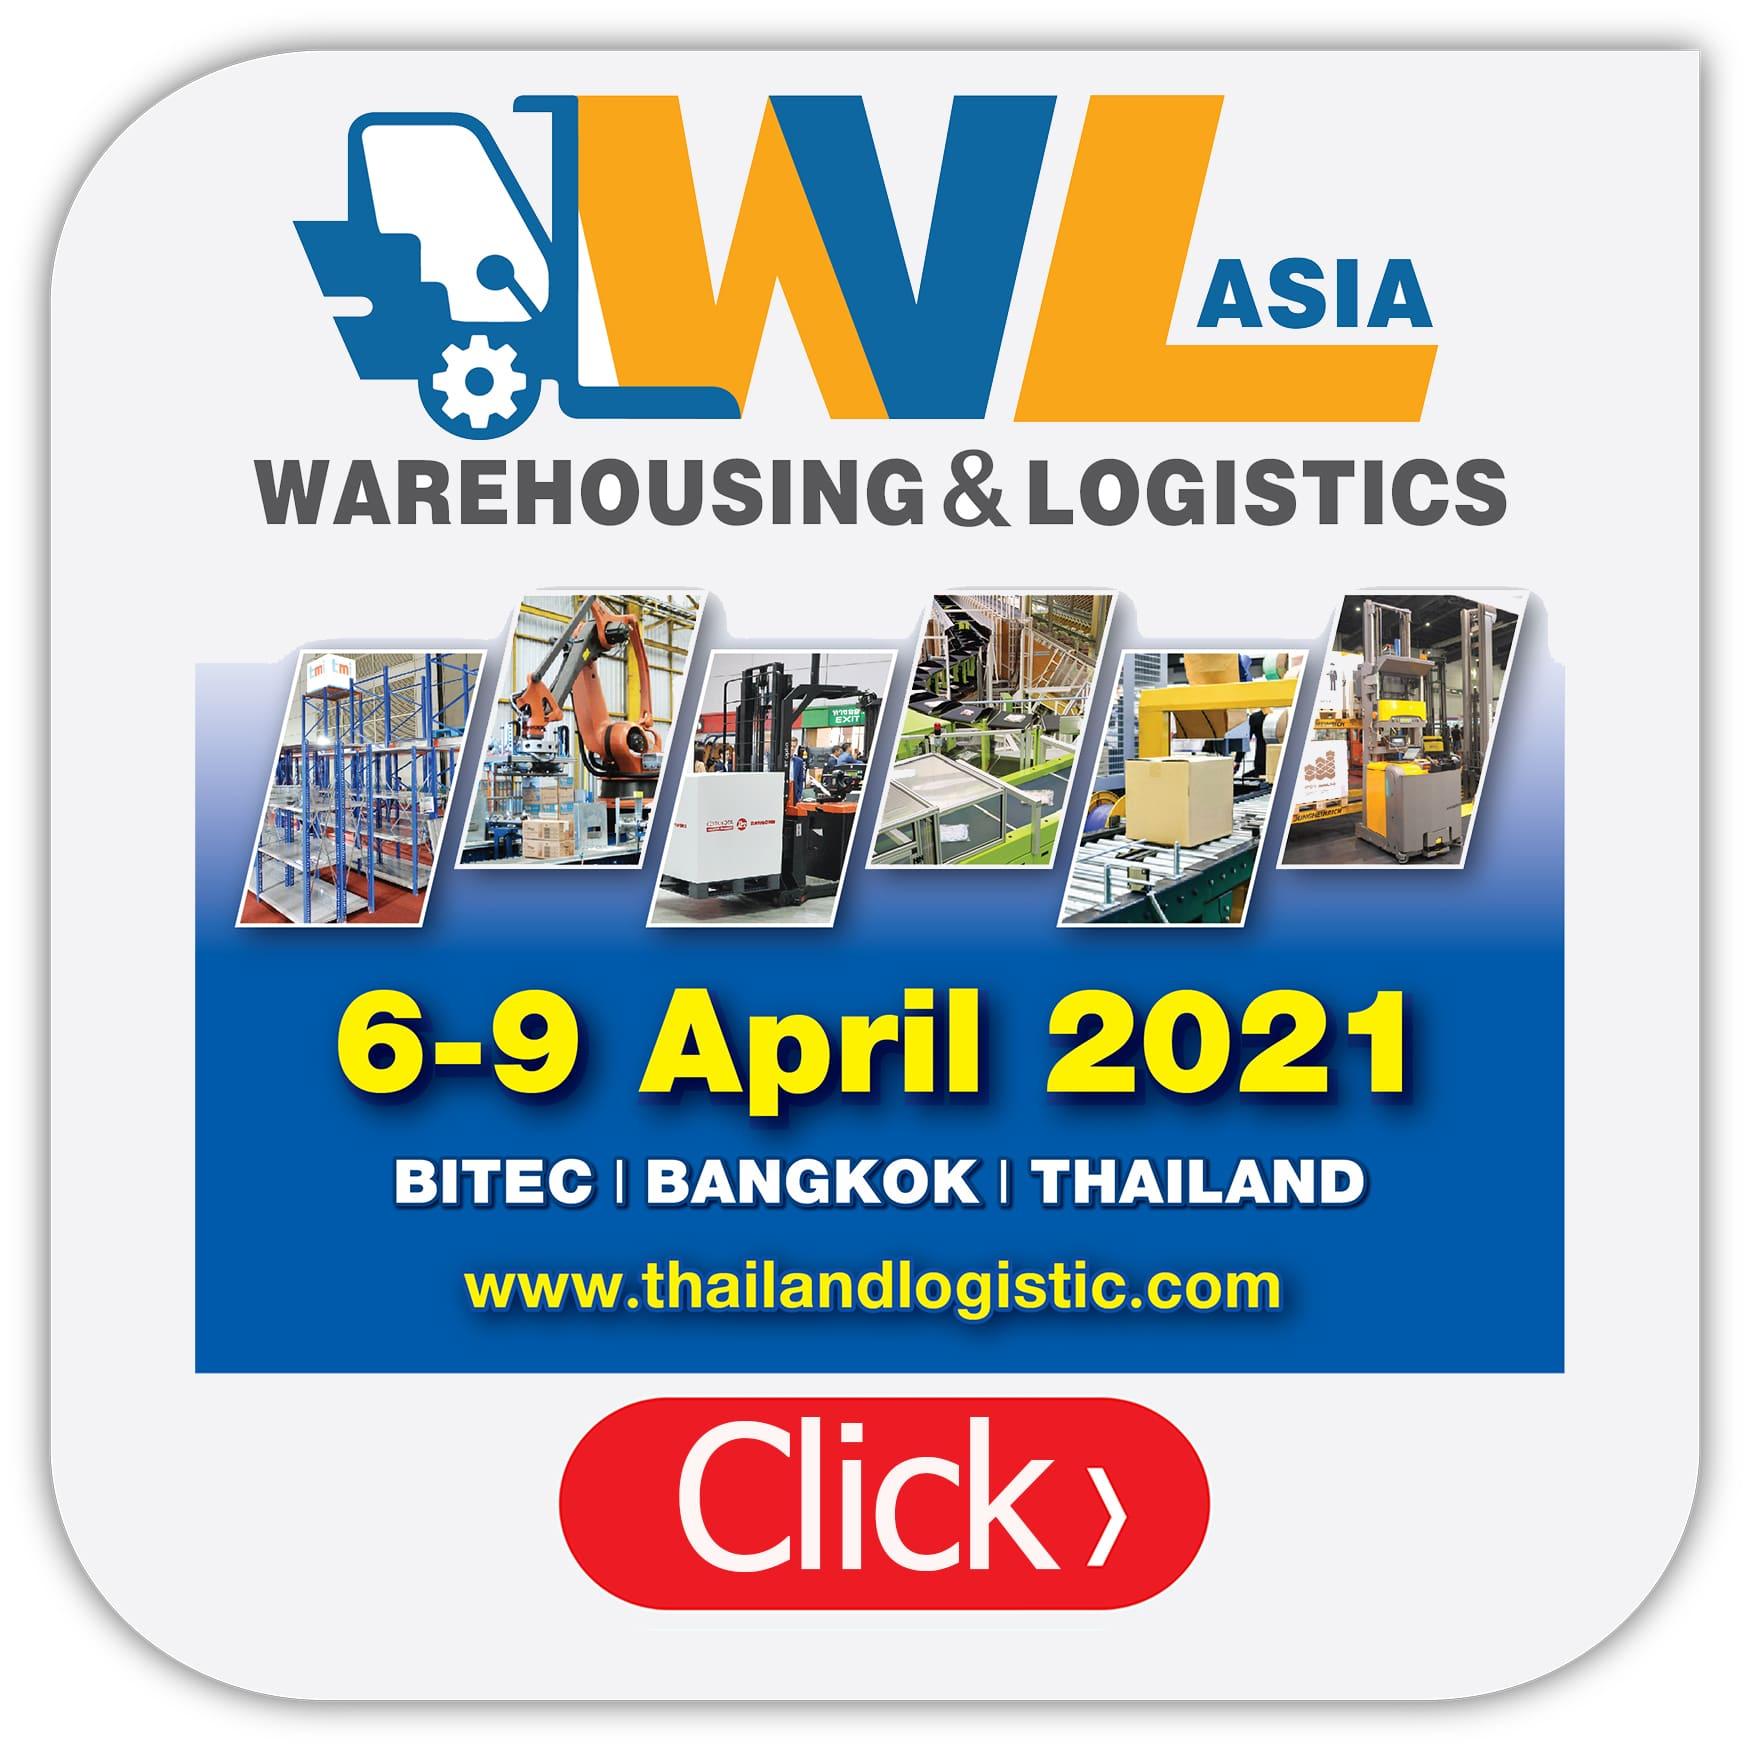 link-en-warehouselogistics